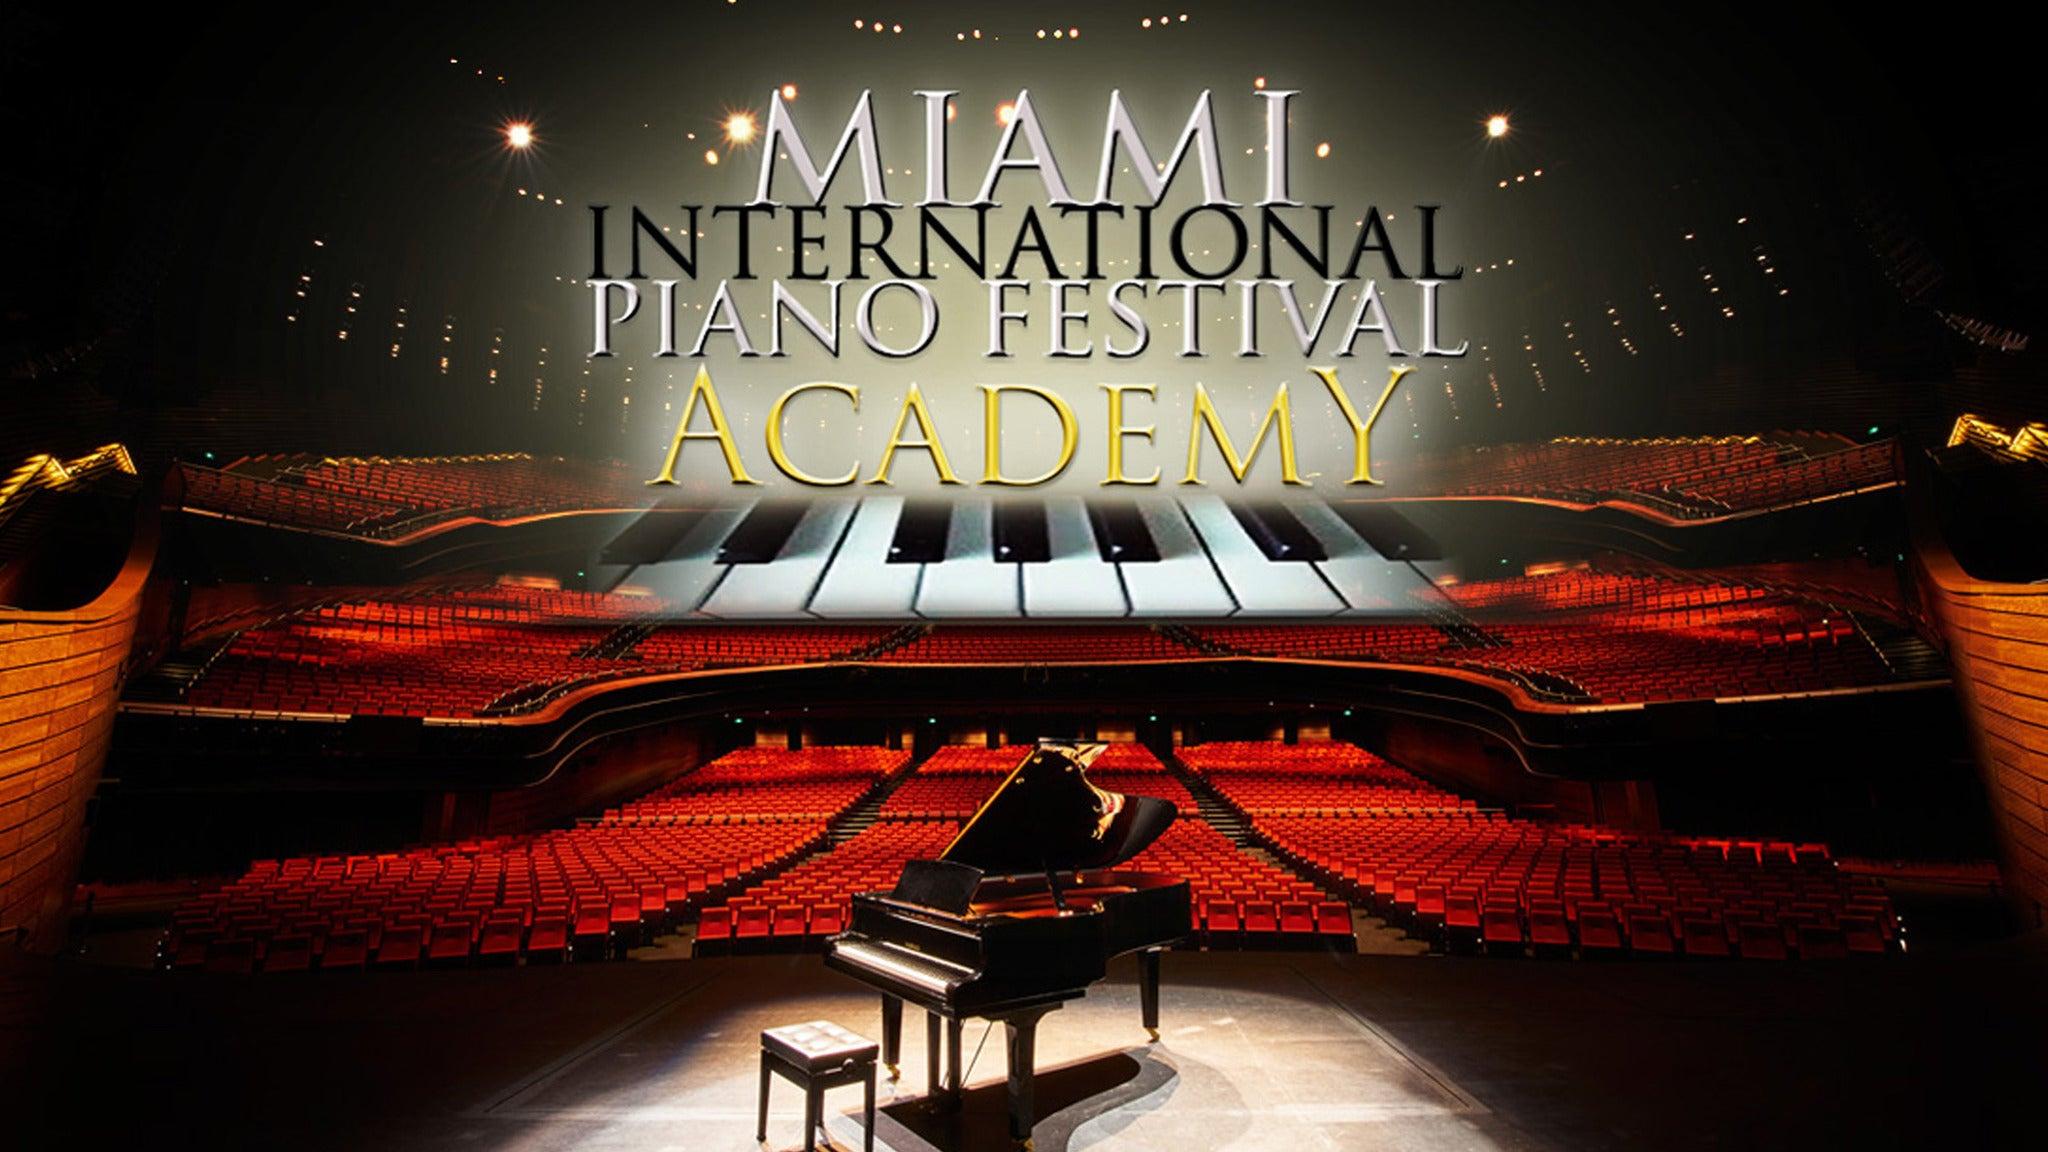 Miami International Piano Festival - Nikolay Khozyainov